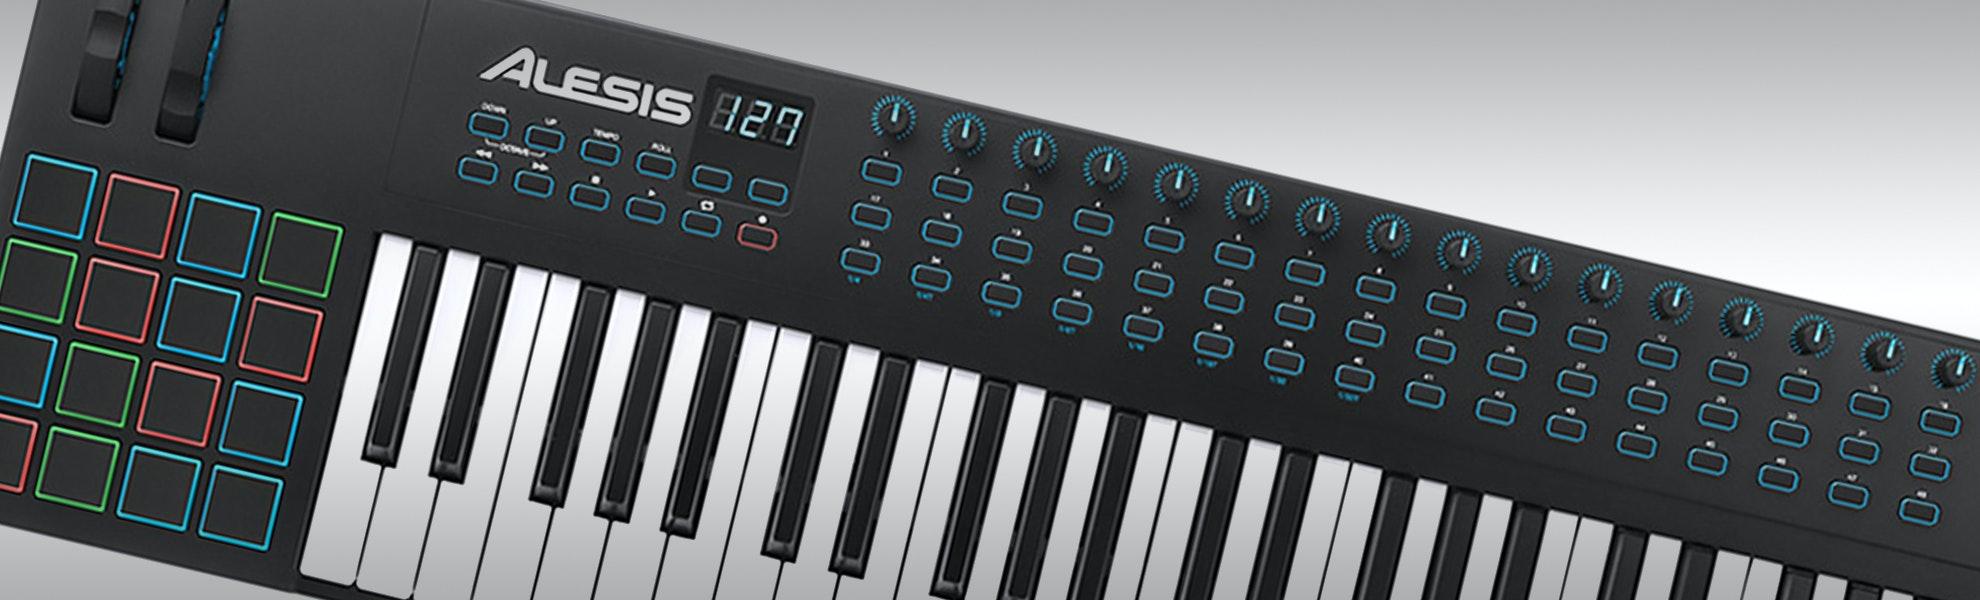 Alesis VI61 61-Key USB/MIDI Keyboard Controller